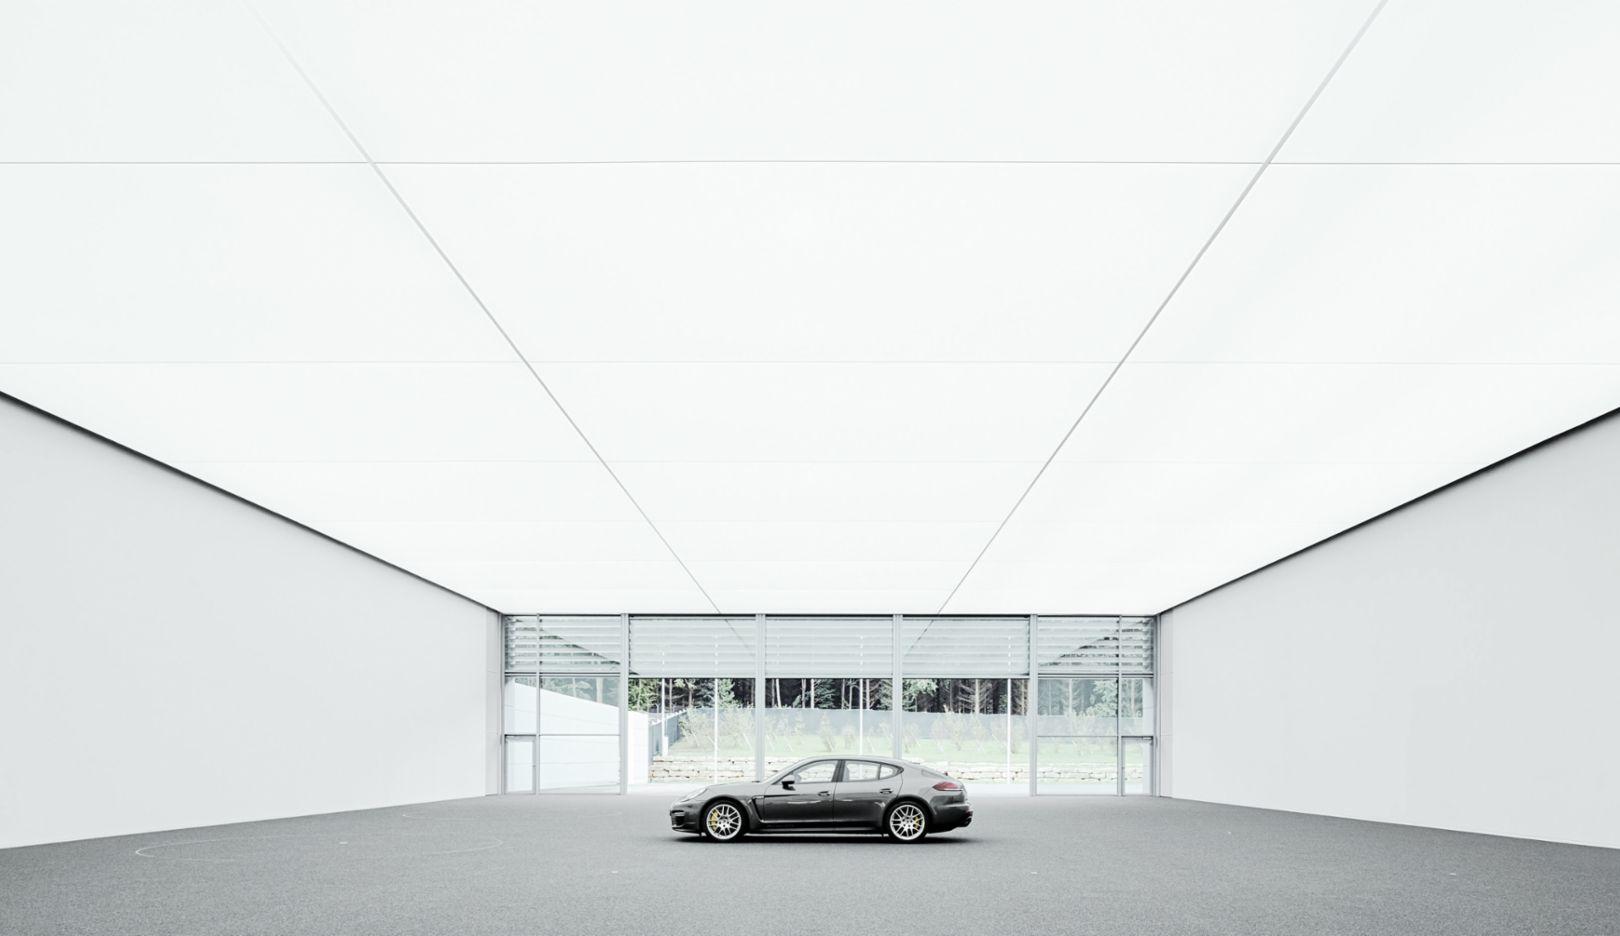 Panamera Turbo S Executive, Entwicklungszentrum, Weissach, 2014, Porsche AG